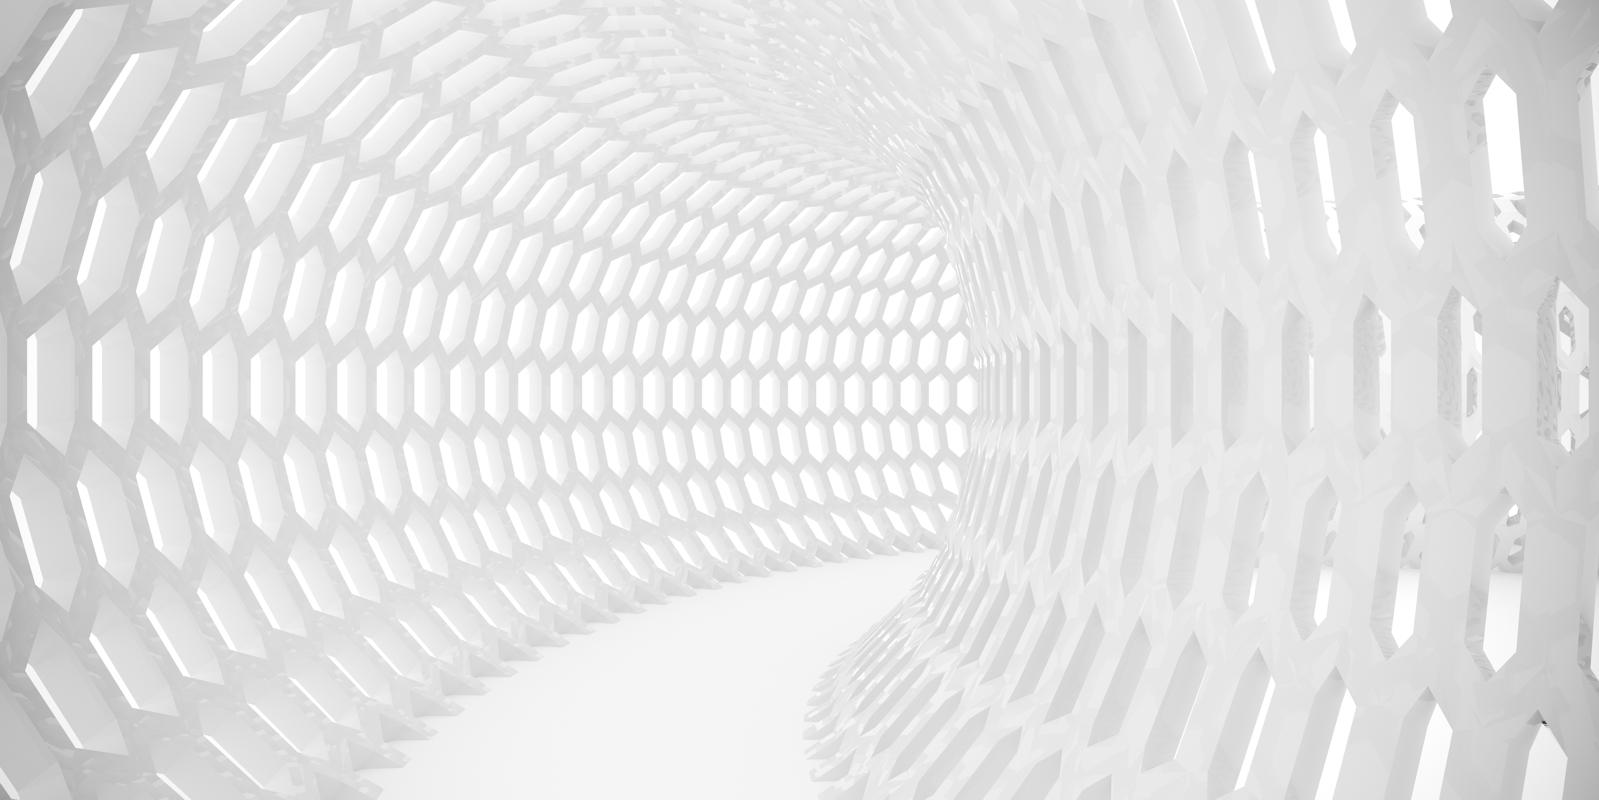 Vlies Tapete Xxl Poster Fototapete 3d Effekt Rohre Weiss Muster